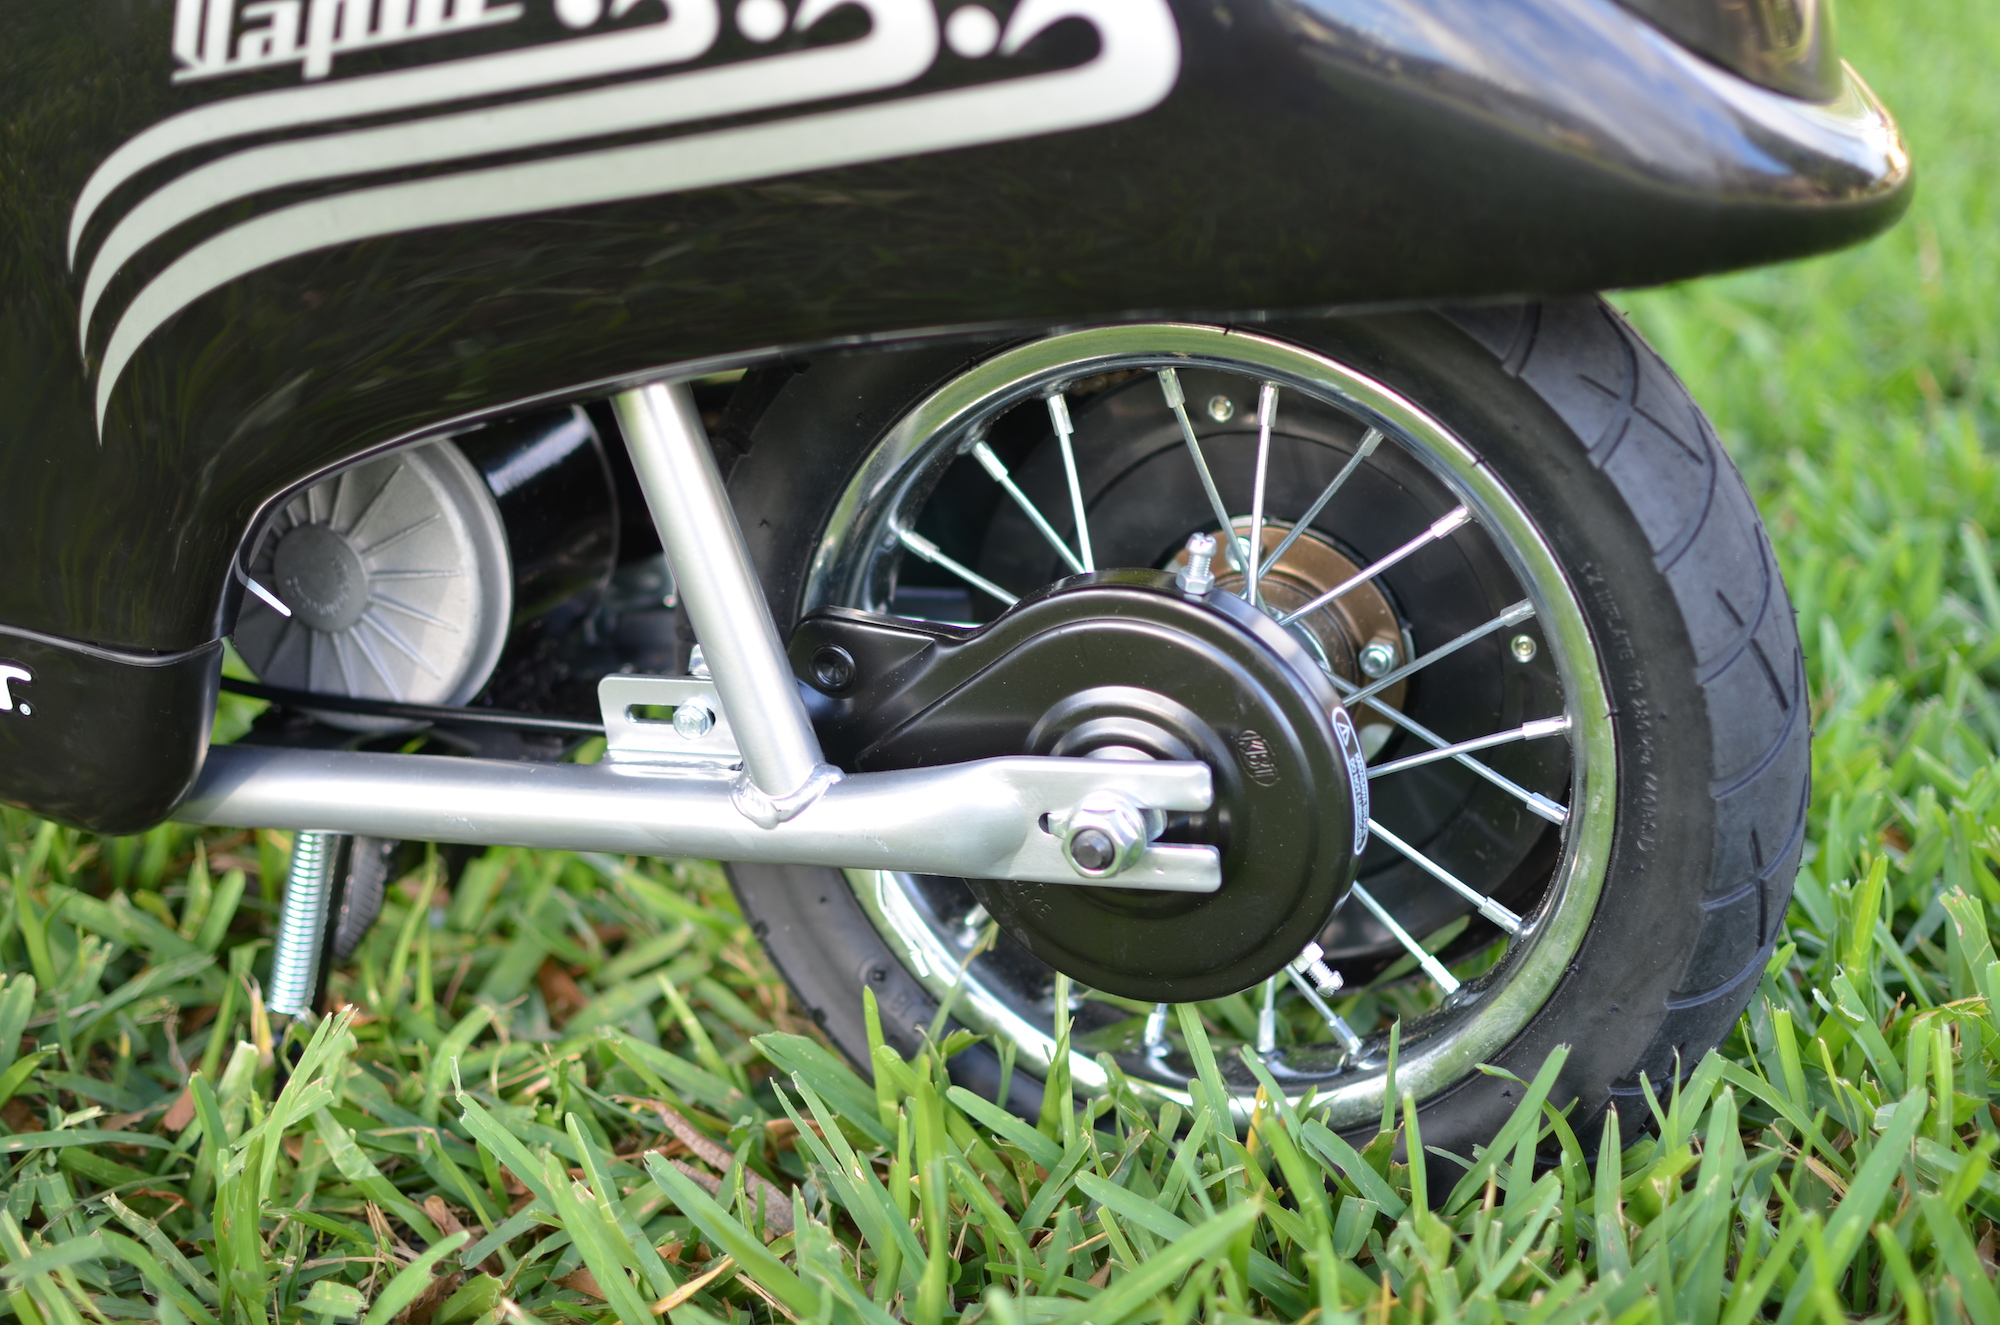 Review: Razor MX350 electric dirt bike and Pocket Mod